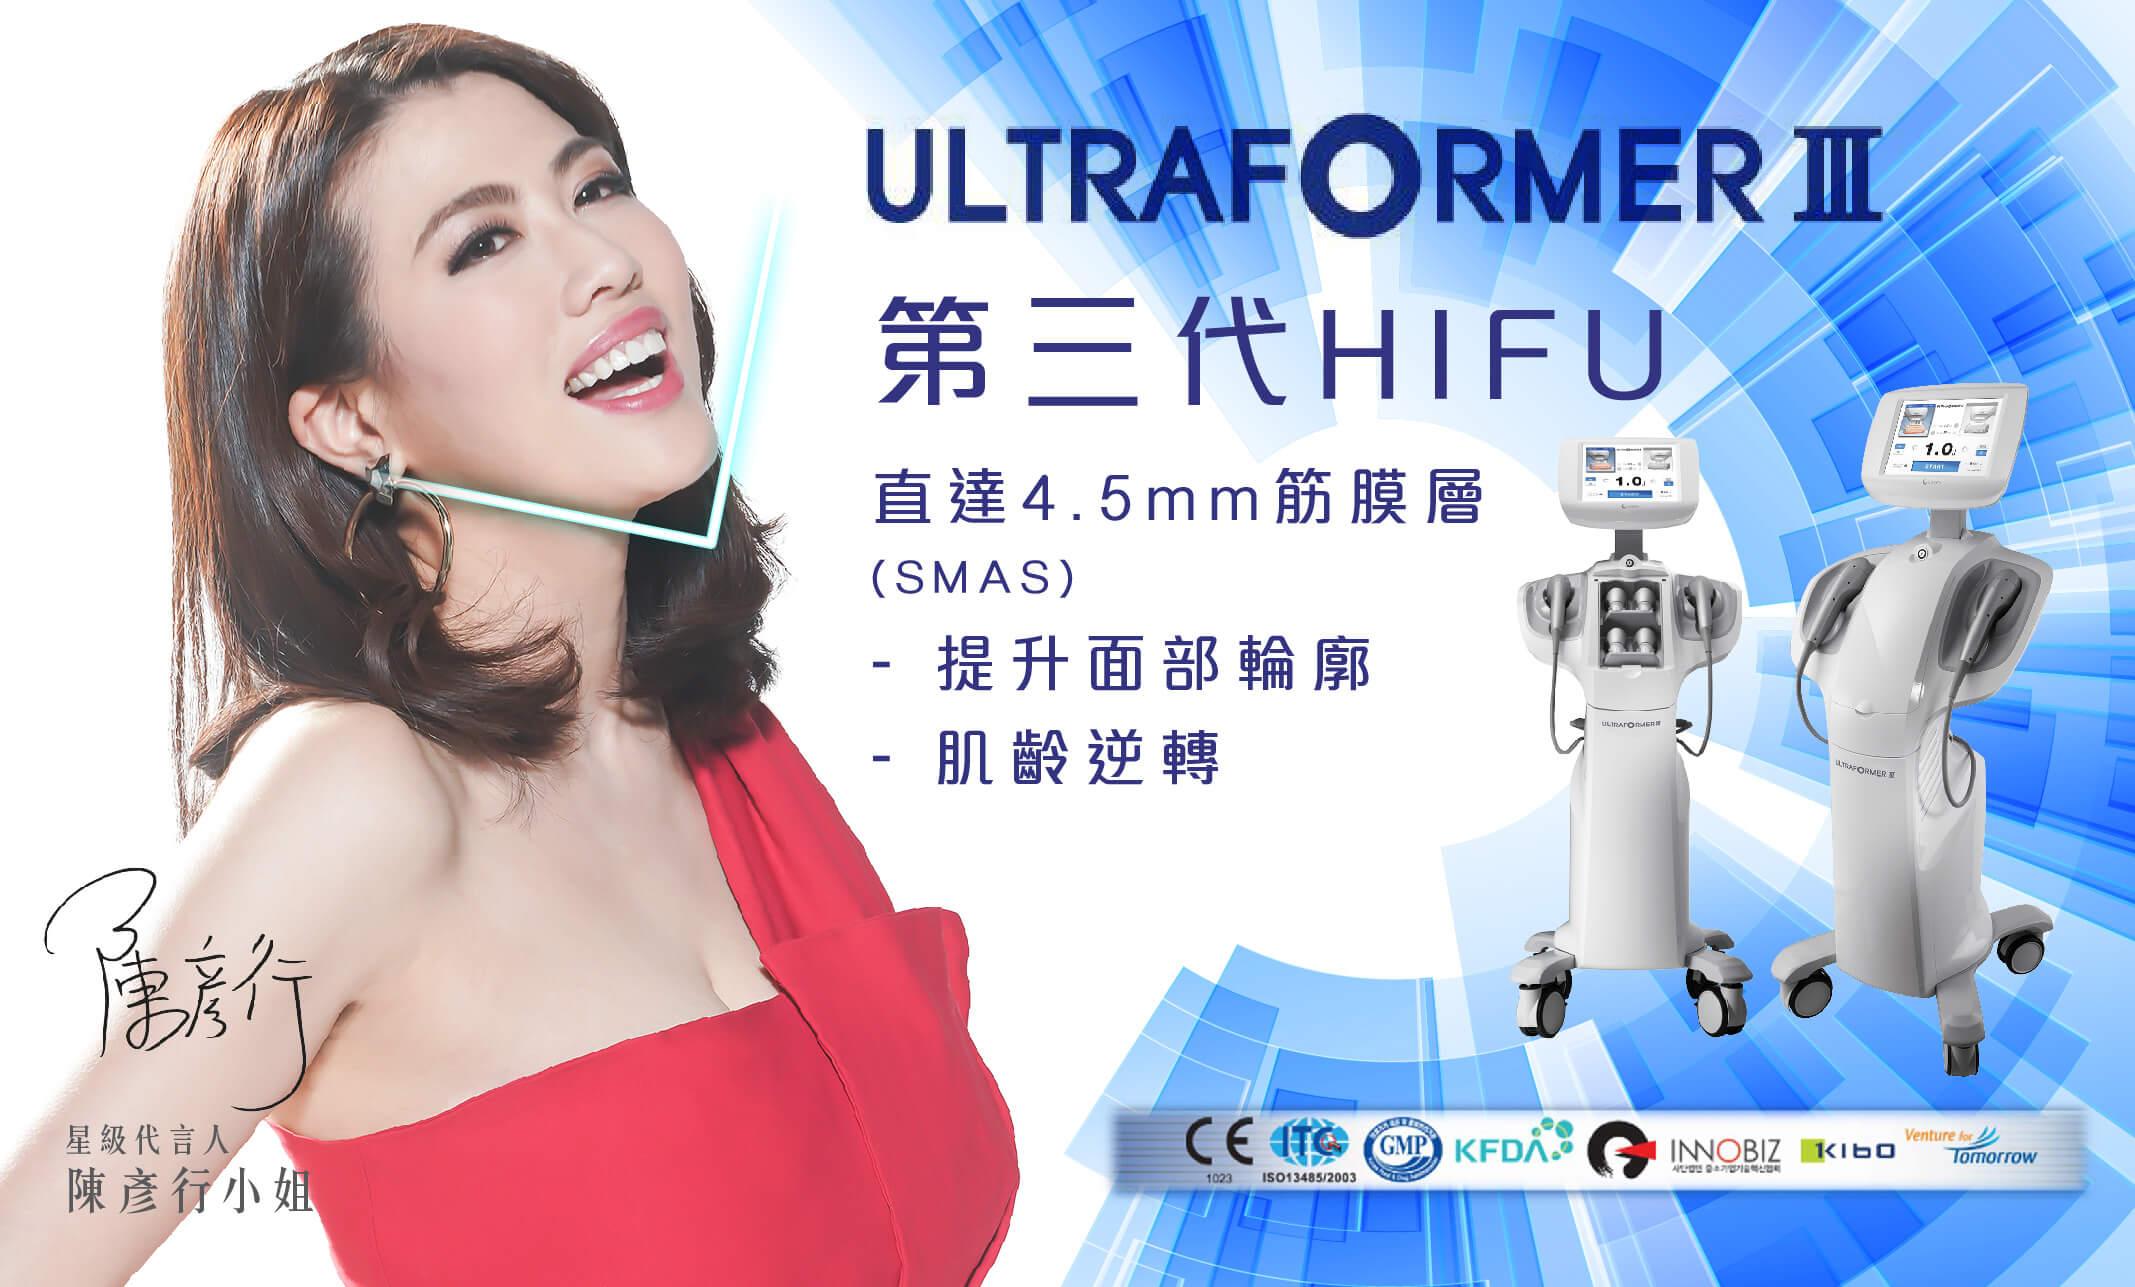 Ultraformer